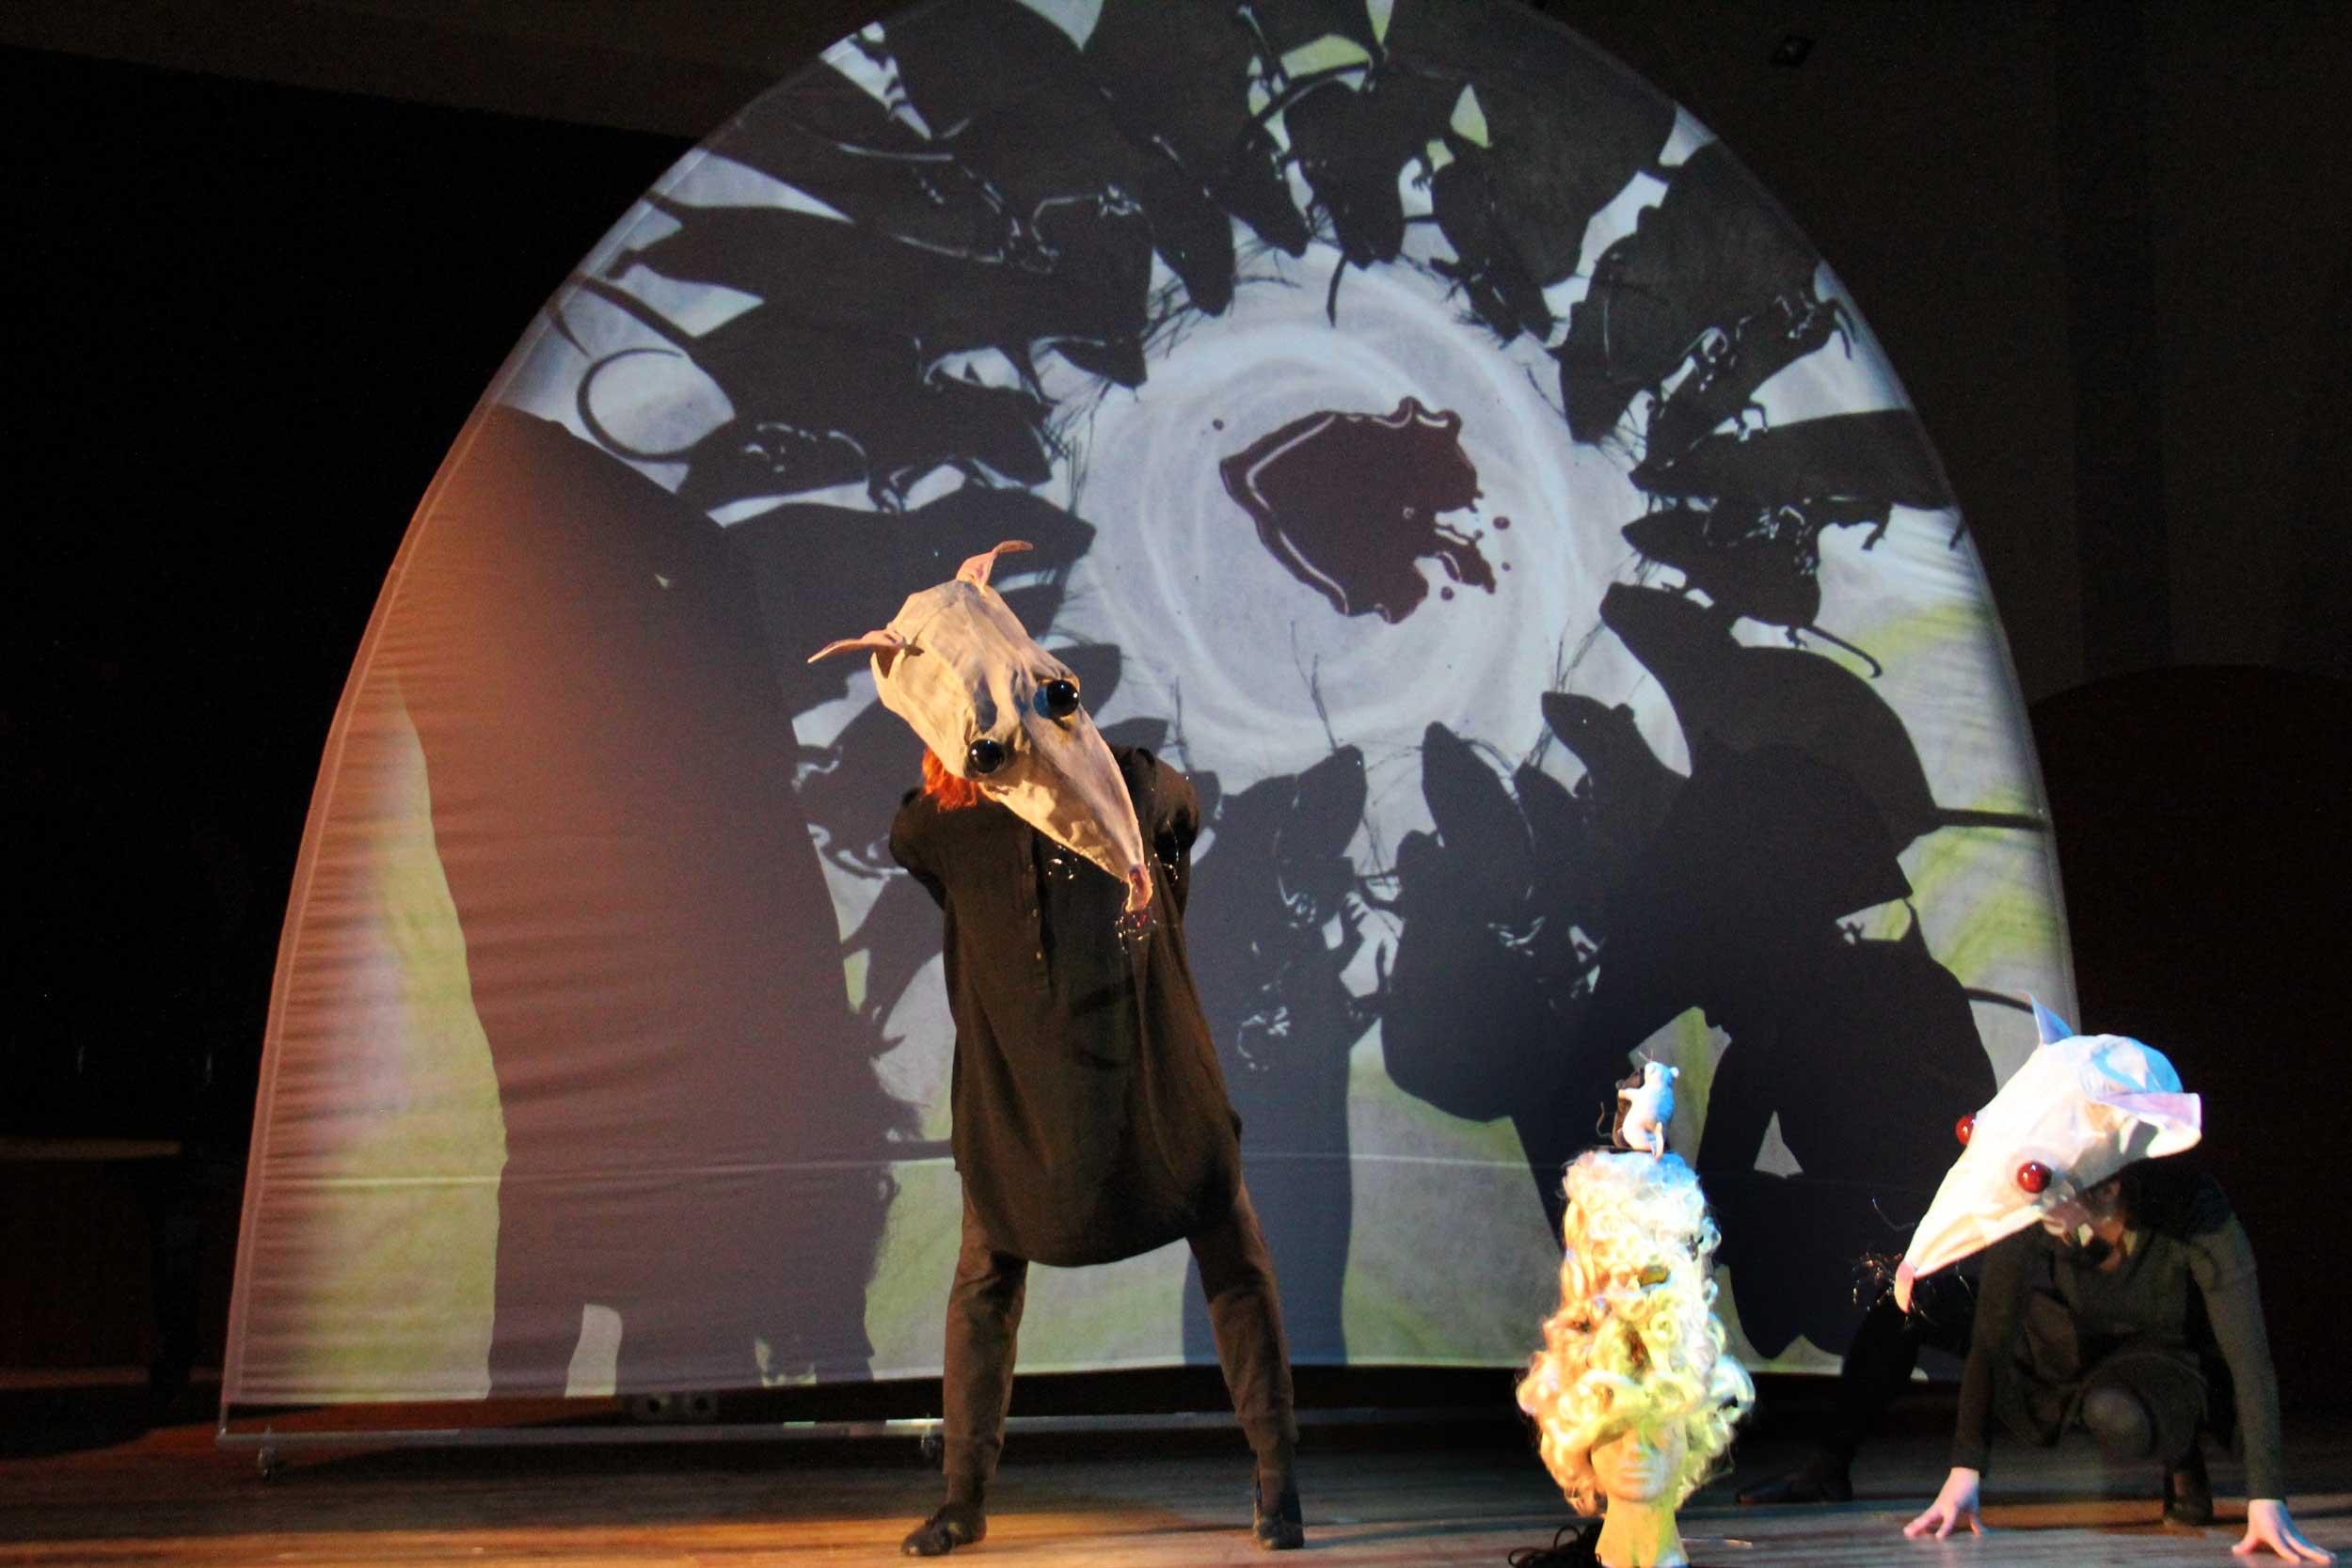 isaac-albeniz-iberia-visual-theatre-figurentheater-IMG_3083.jpg